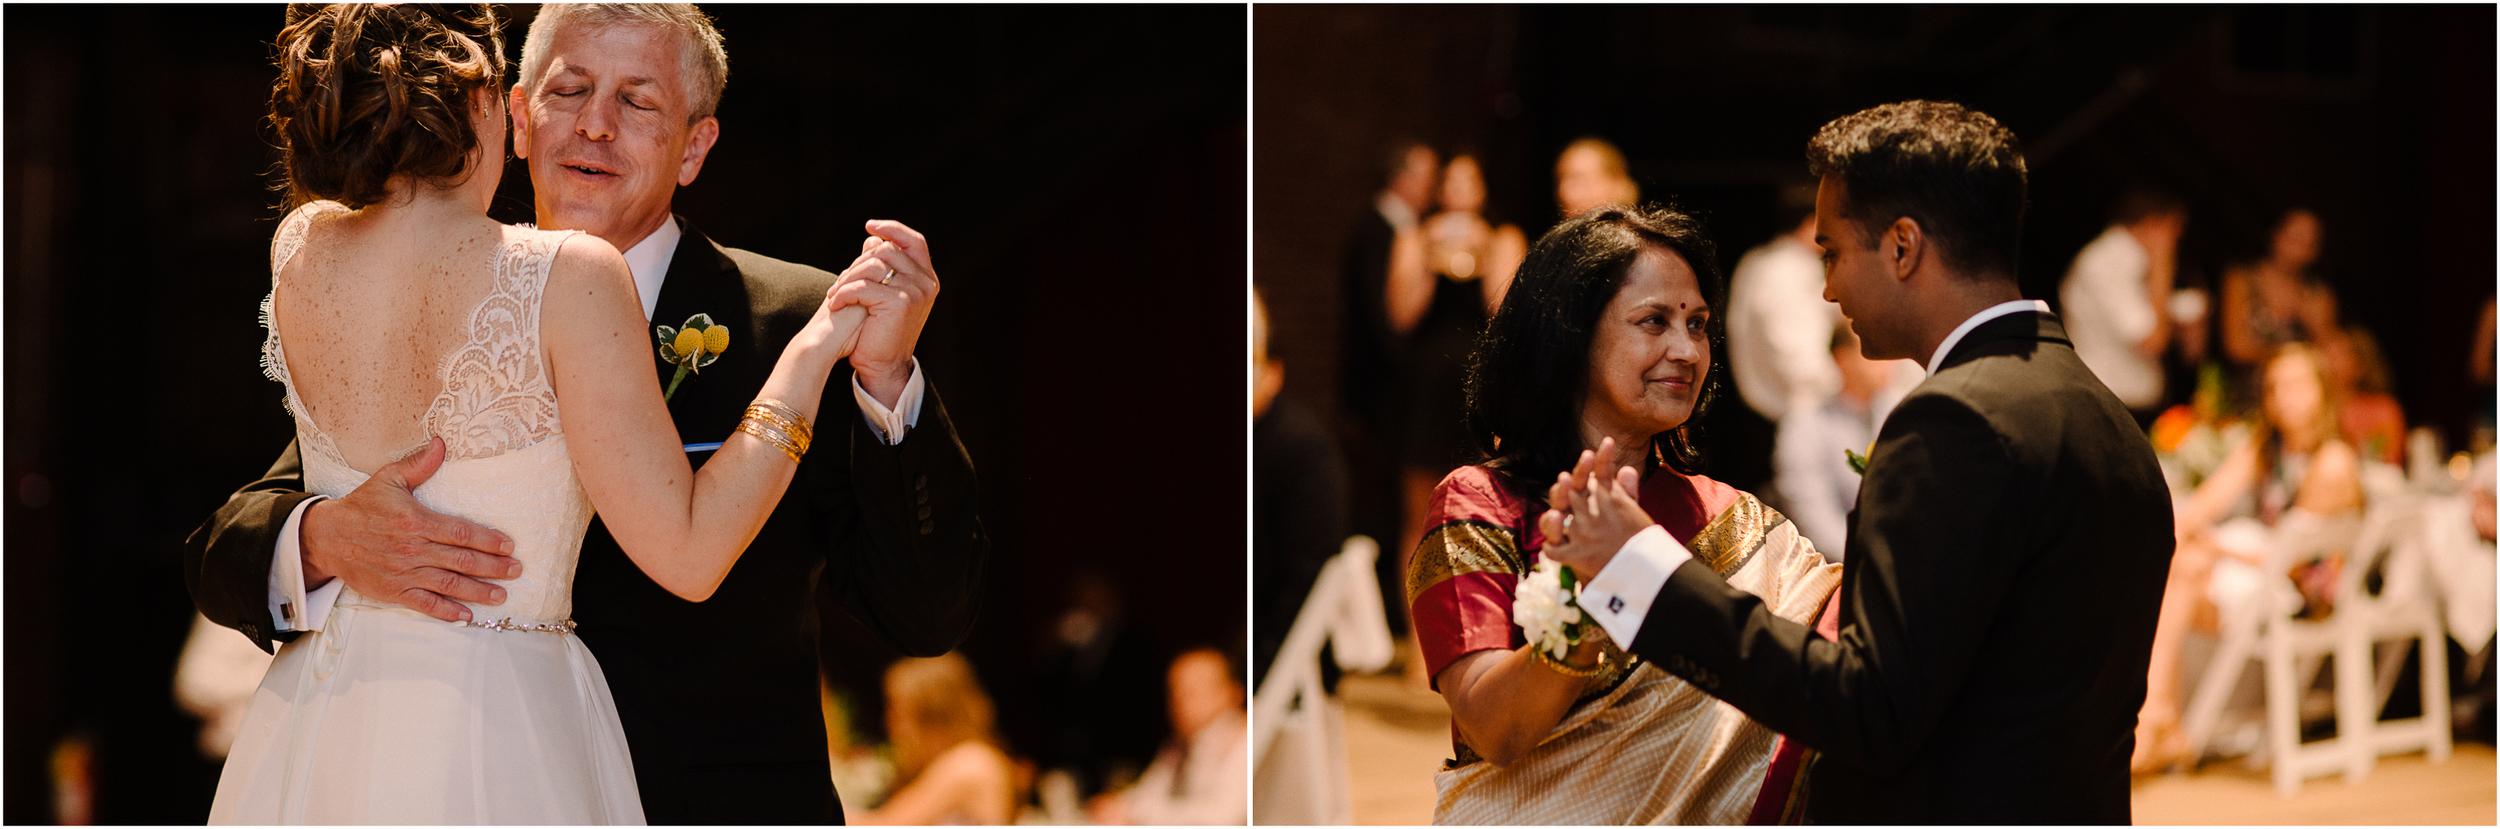 wedding reception pittsburgh opera house.jpg